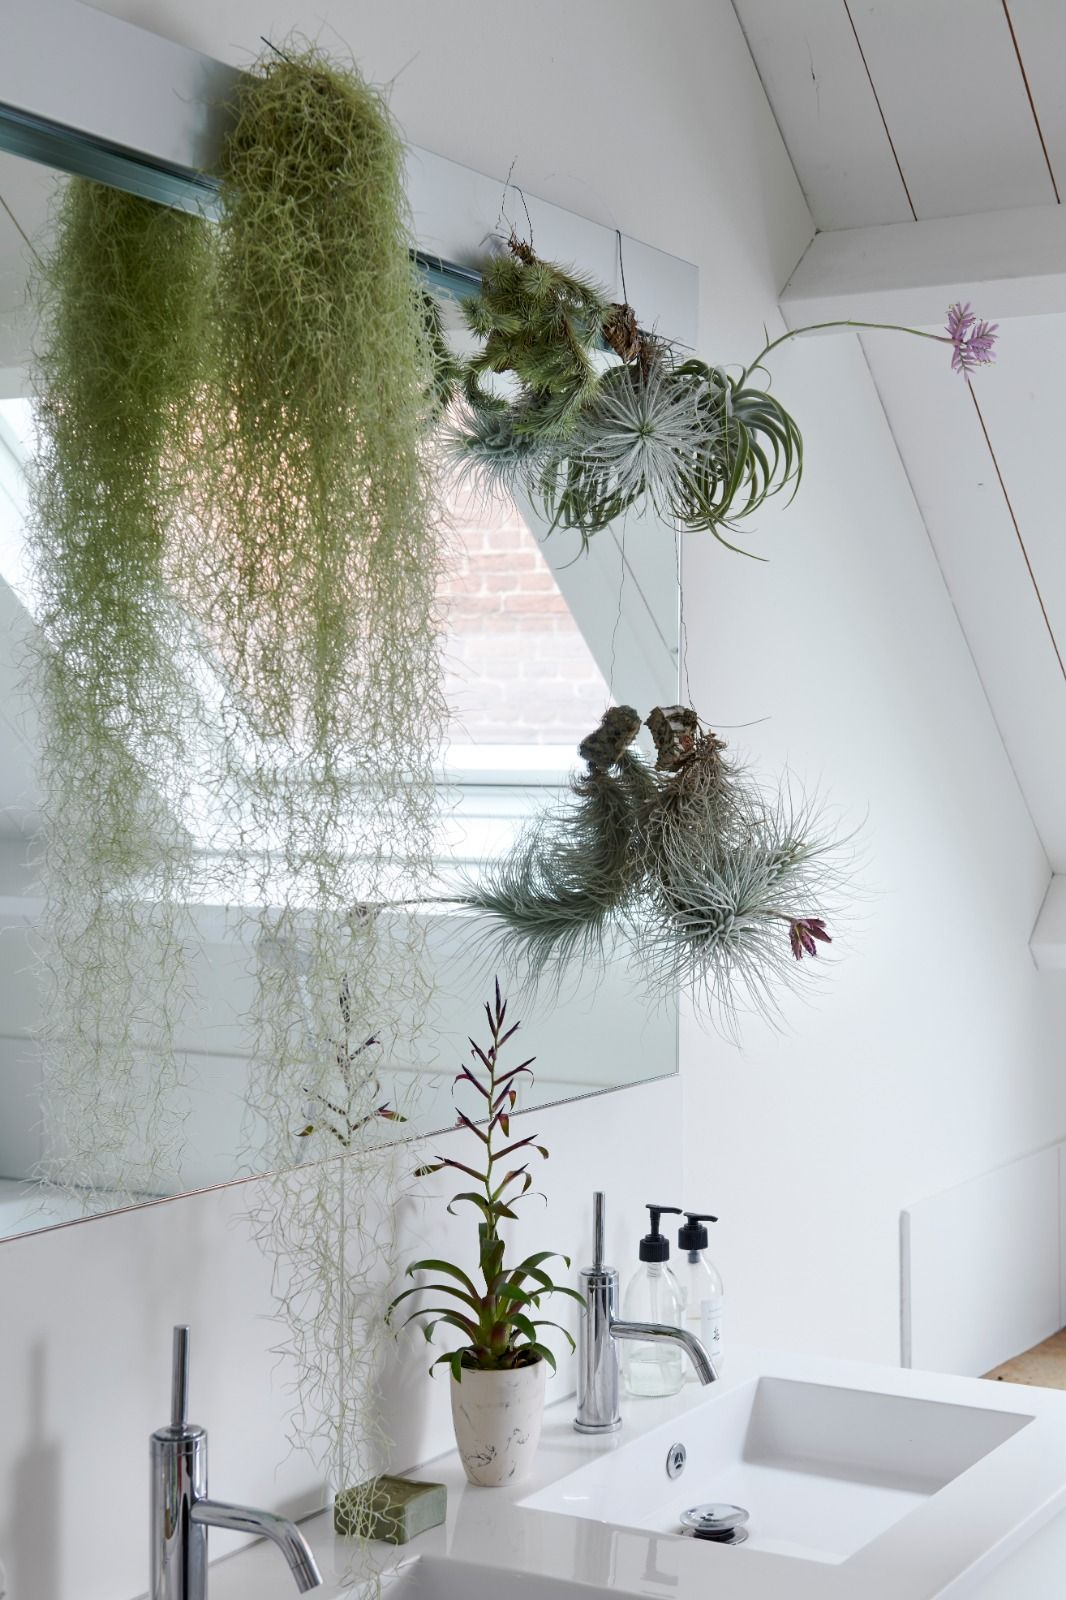 badkamerplanten, planten, gezond, zuurstof, clean living